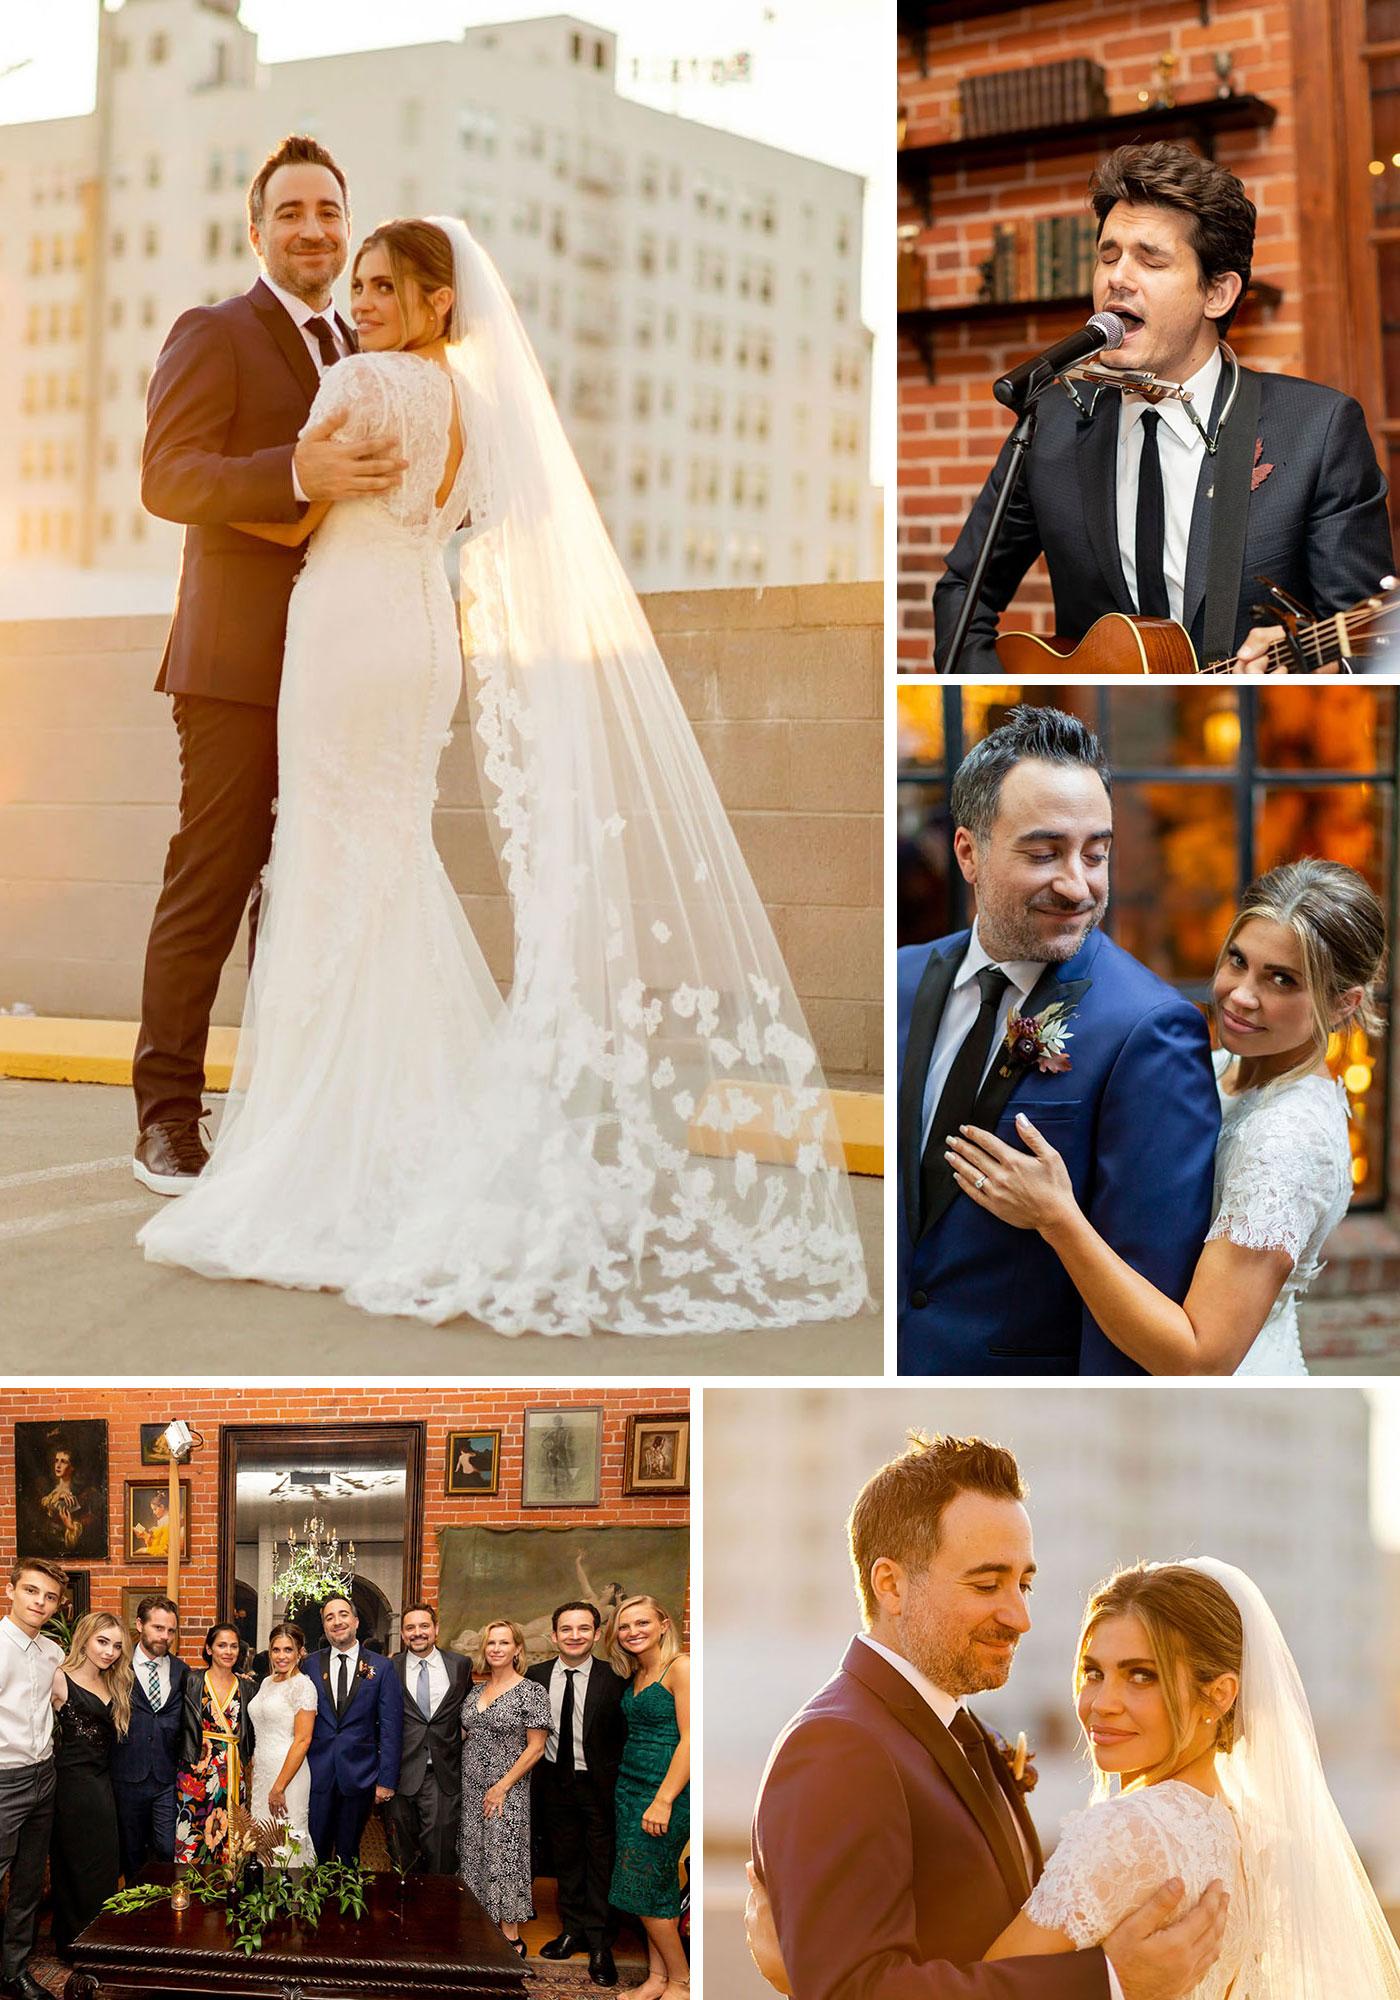 Danielle Fishel's wedding on Green Wedding Shoes